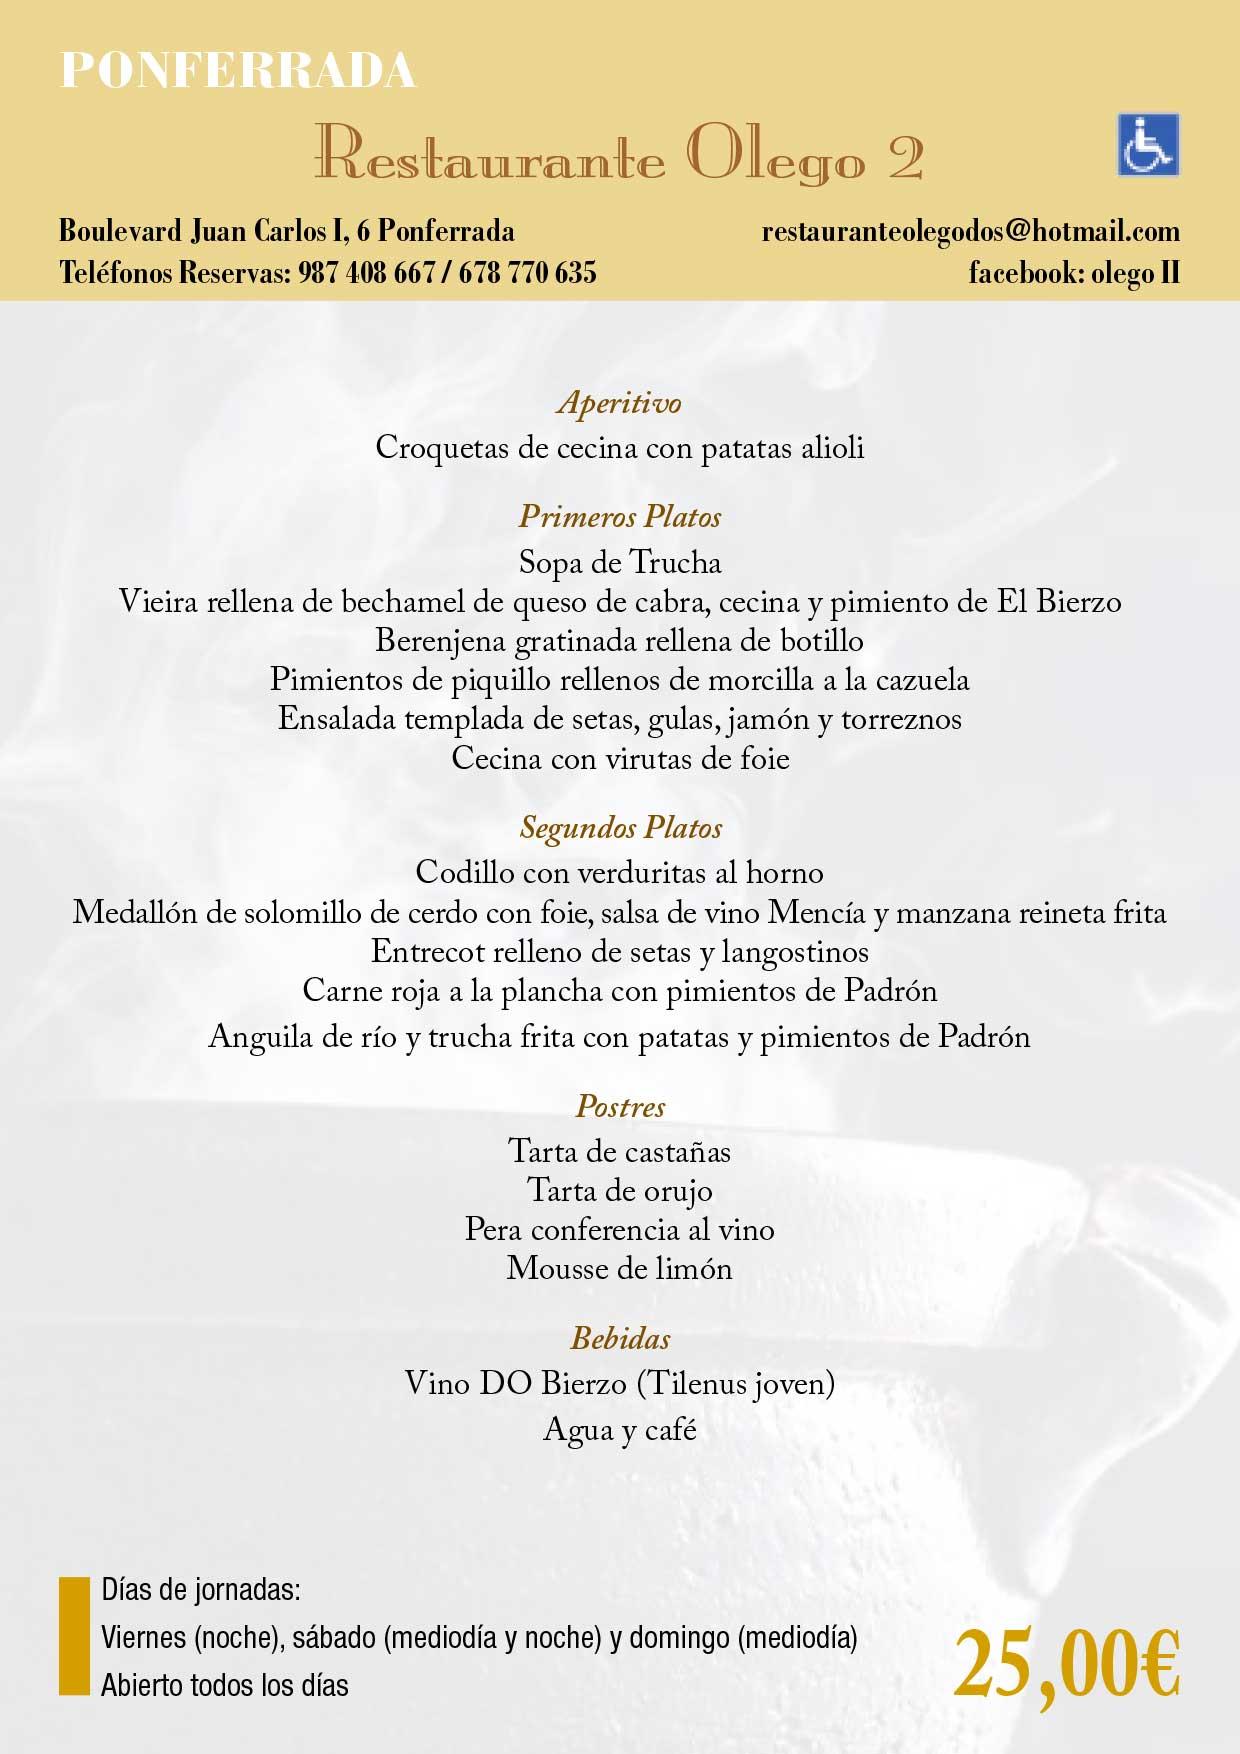 XXXIII Jornadas gastronómicas del Bierzo 2017. Restaurantes participantes 23